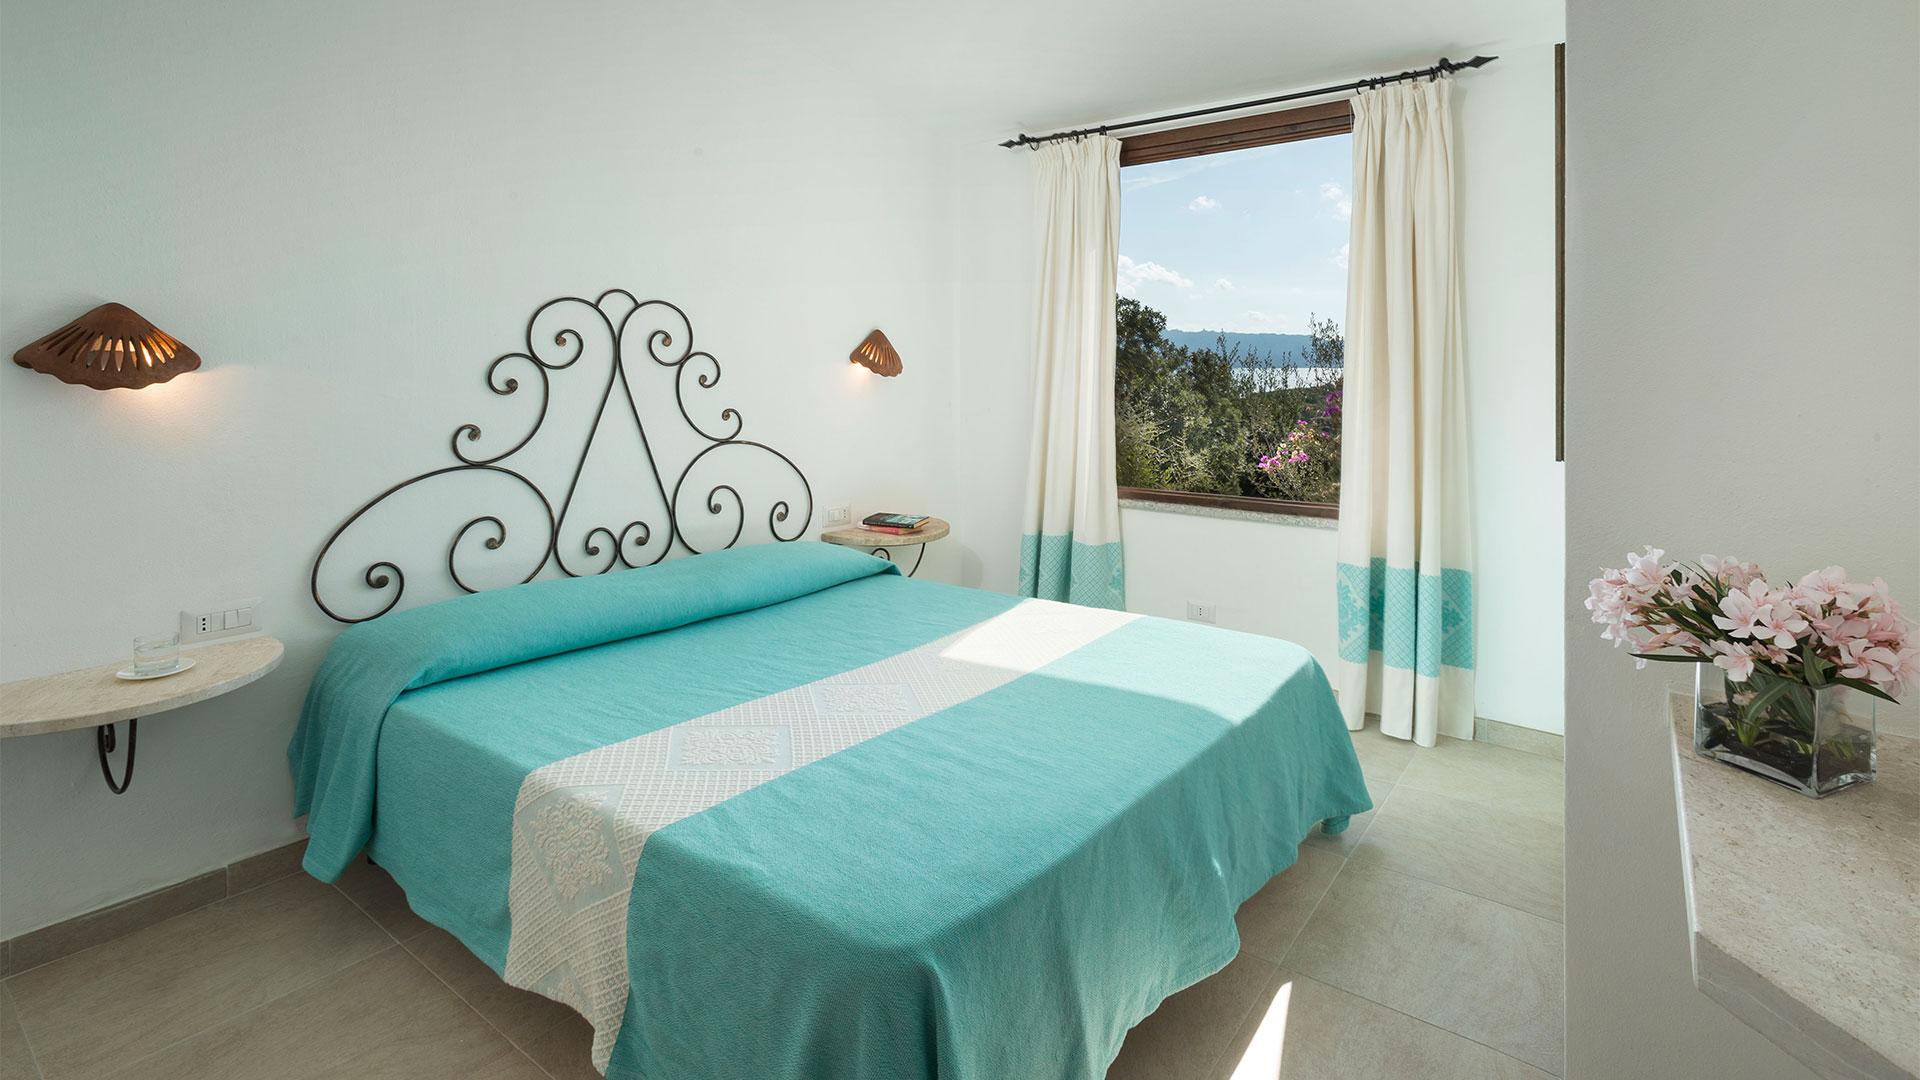 residence-mirto-slider-appartamenti-mare-sardegna-palau-2